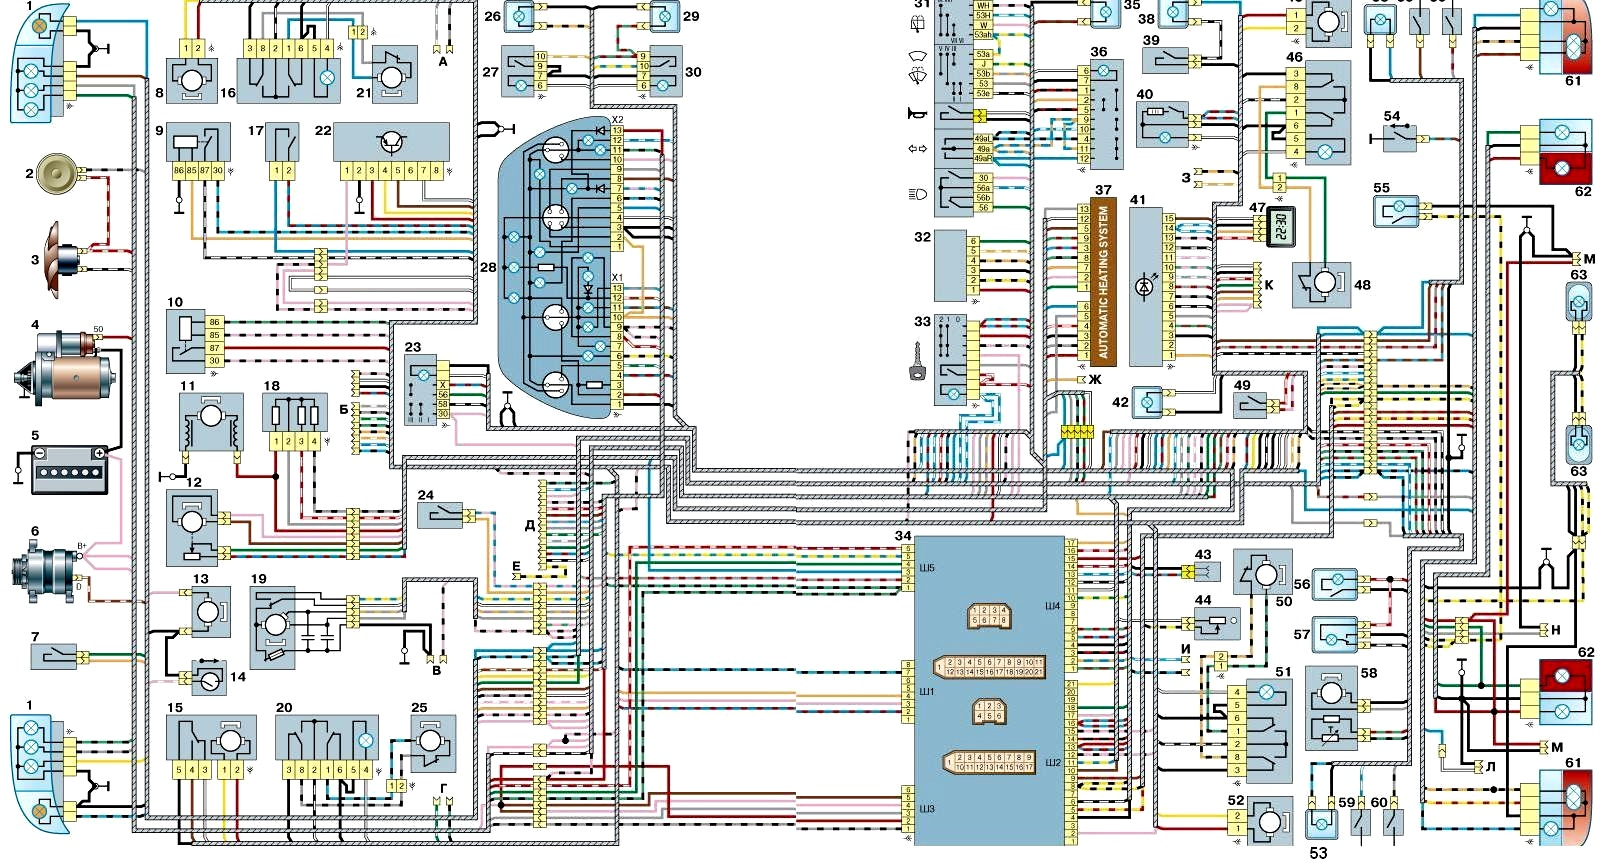 Фото №18 - ВАЗ 2110 инжектор схема